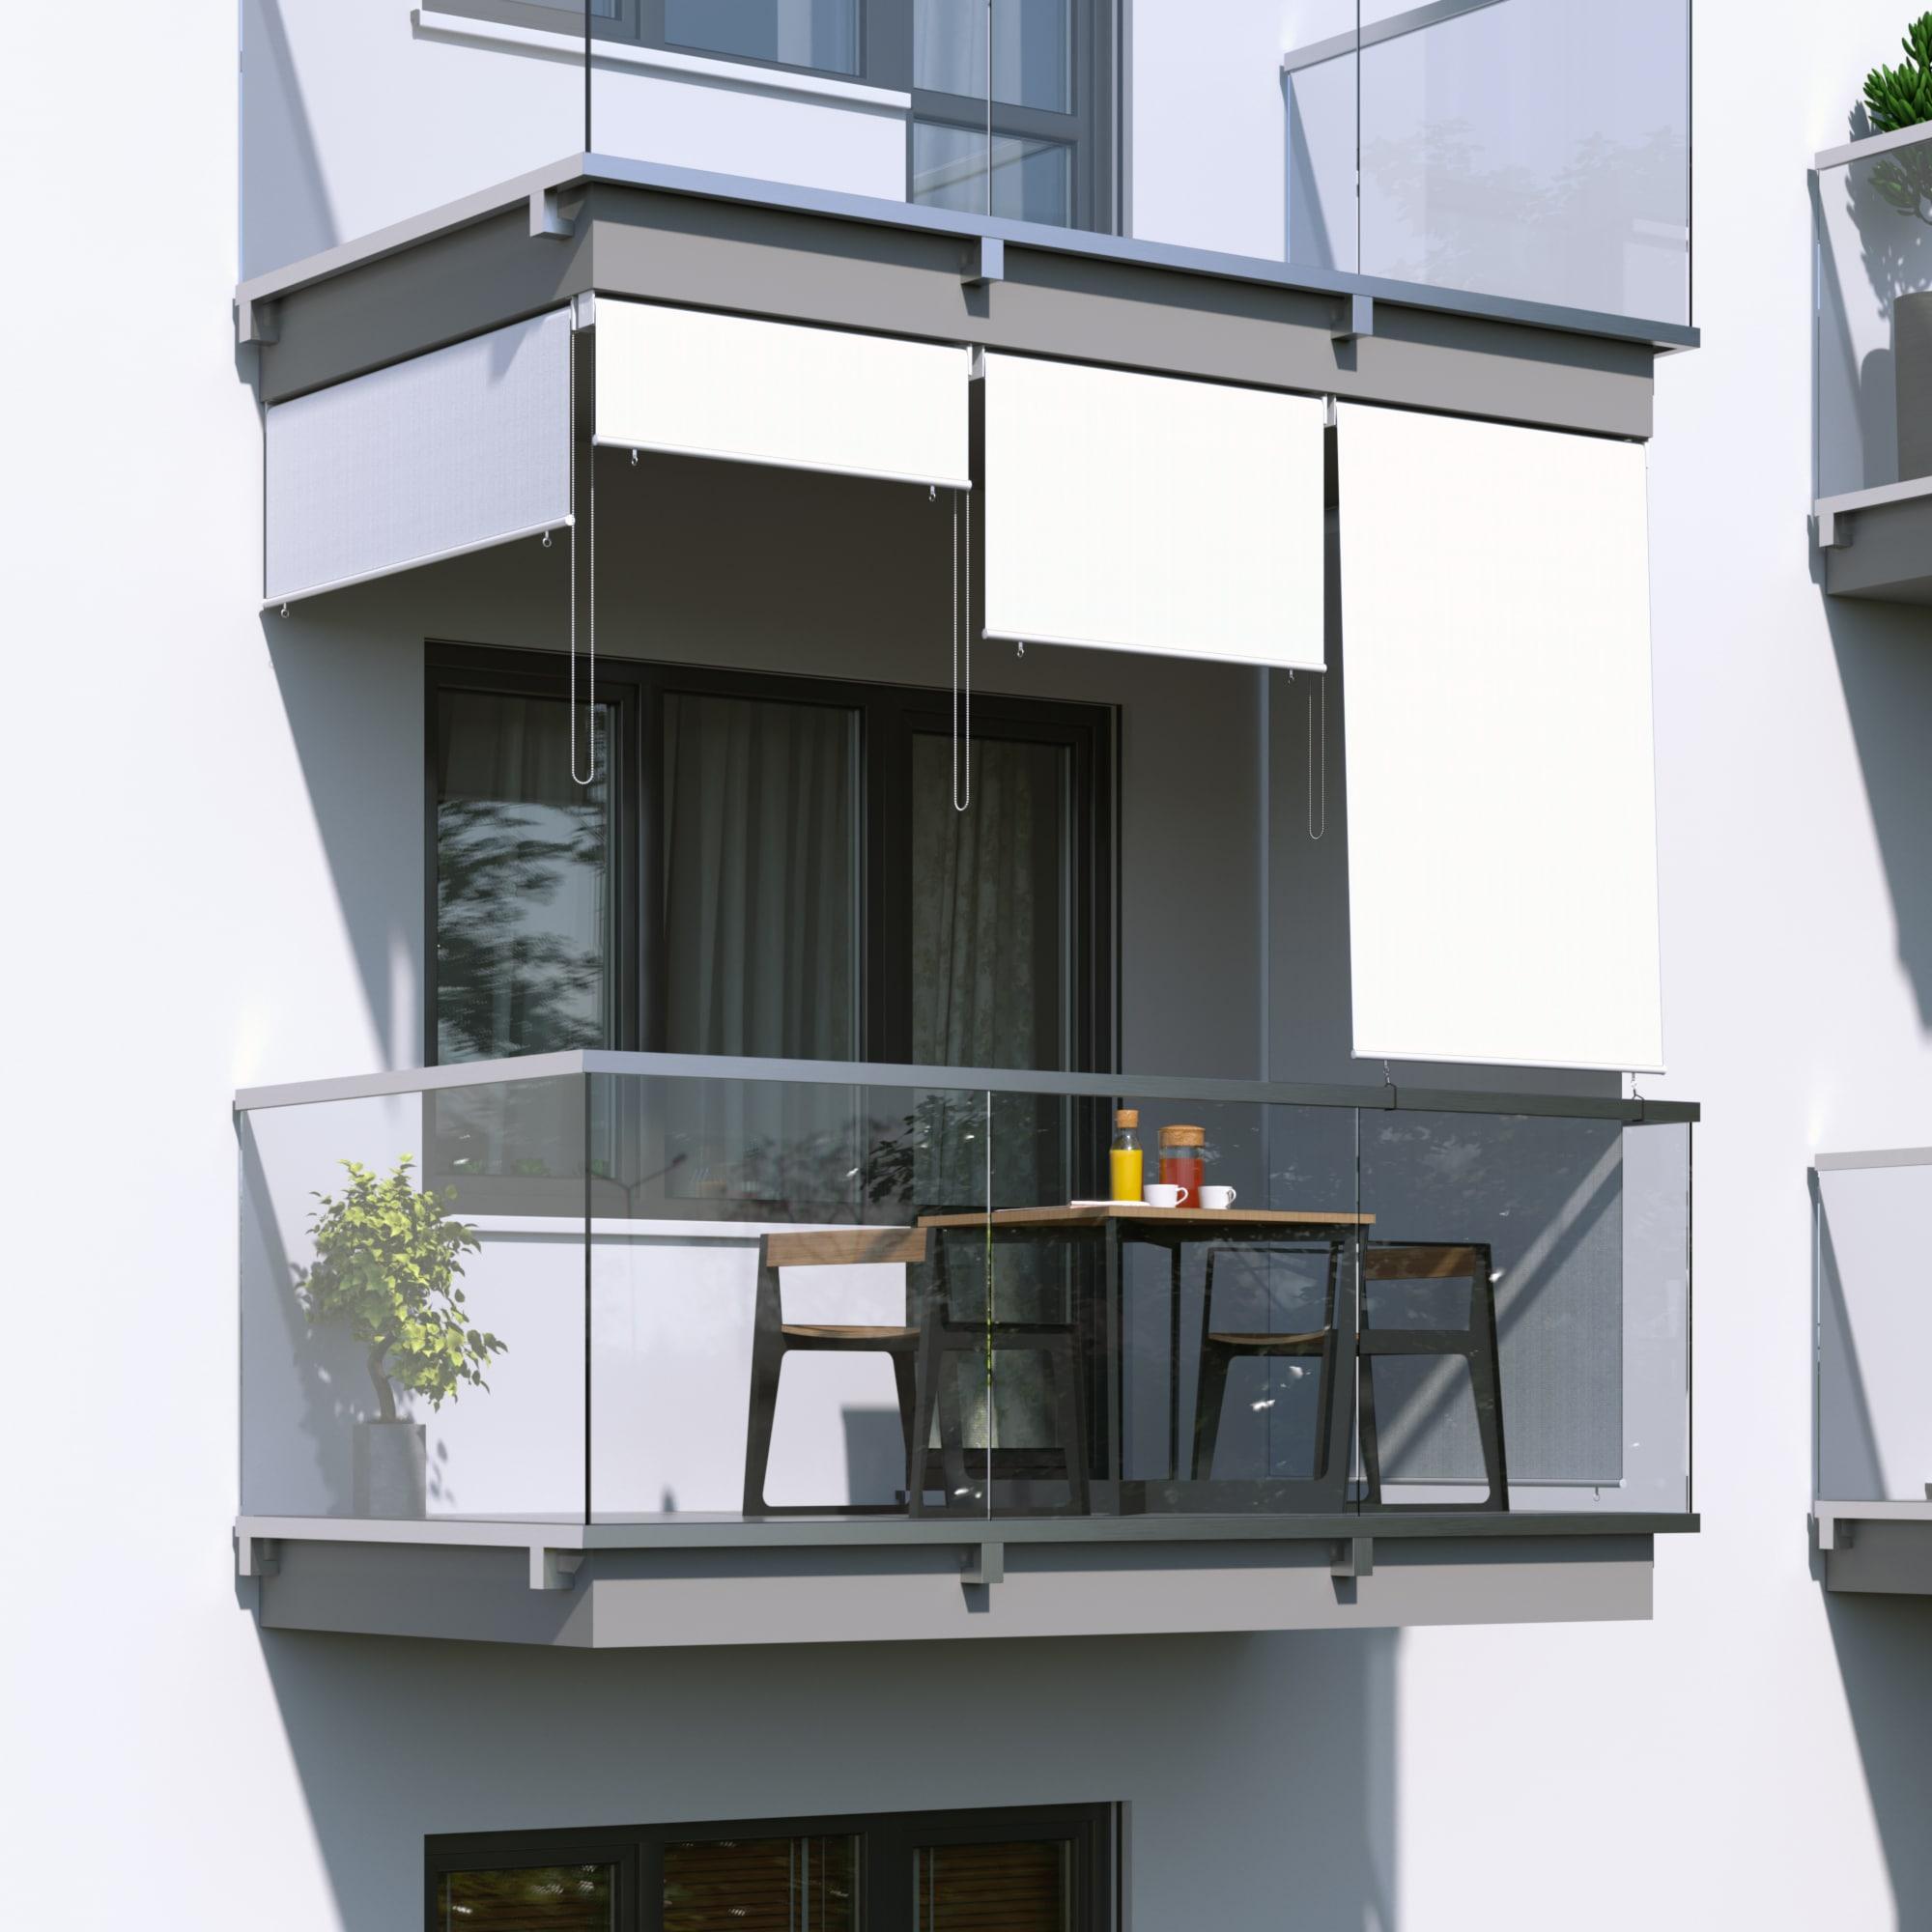 au enrollo balkon senkrechtmarkise 180 x 140cm wei jarolift. Black Bedroom Furniture Sets. Home Design Ideas